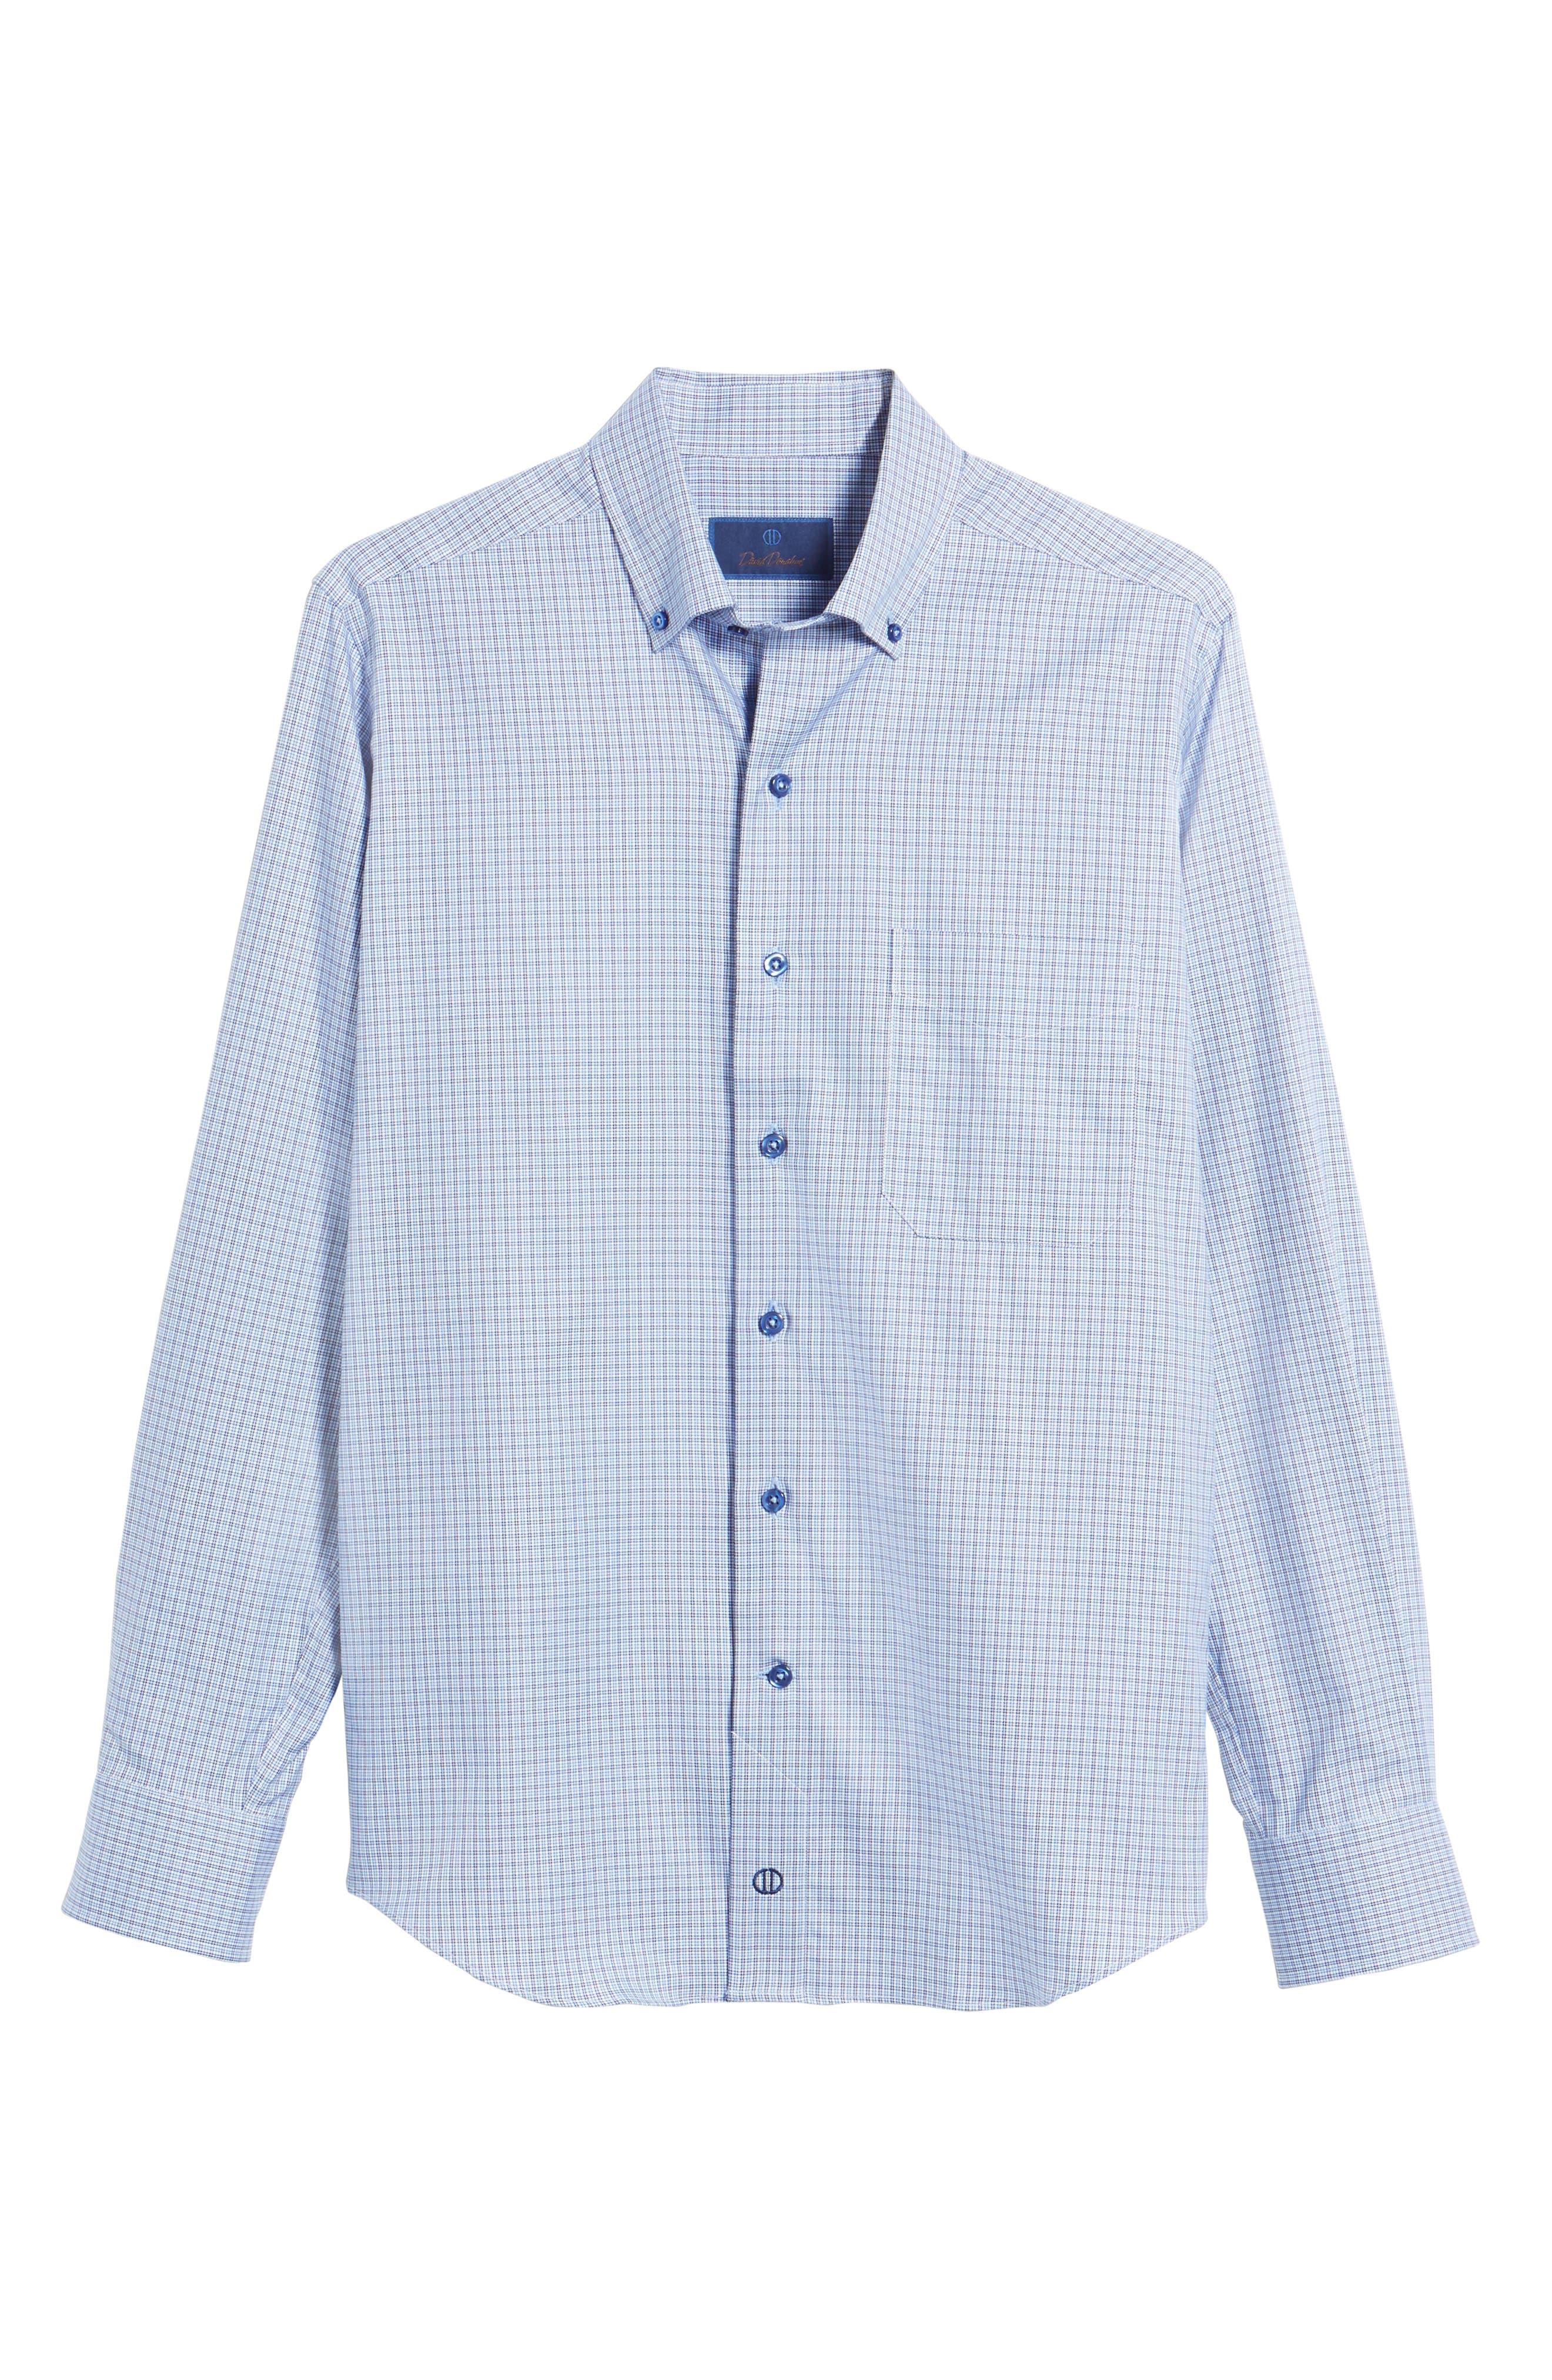 Regular Fit Plaid Sport Shirt,                             Alternate thumbnail 6, color,                             450